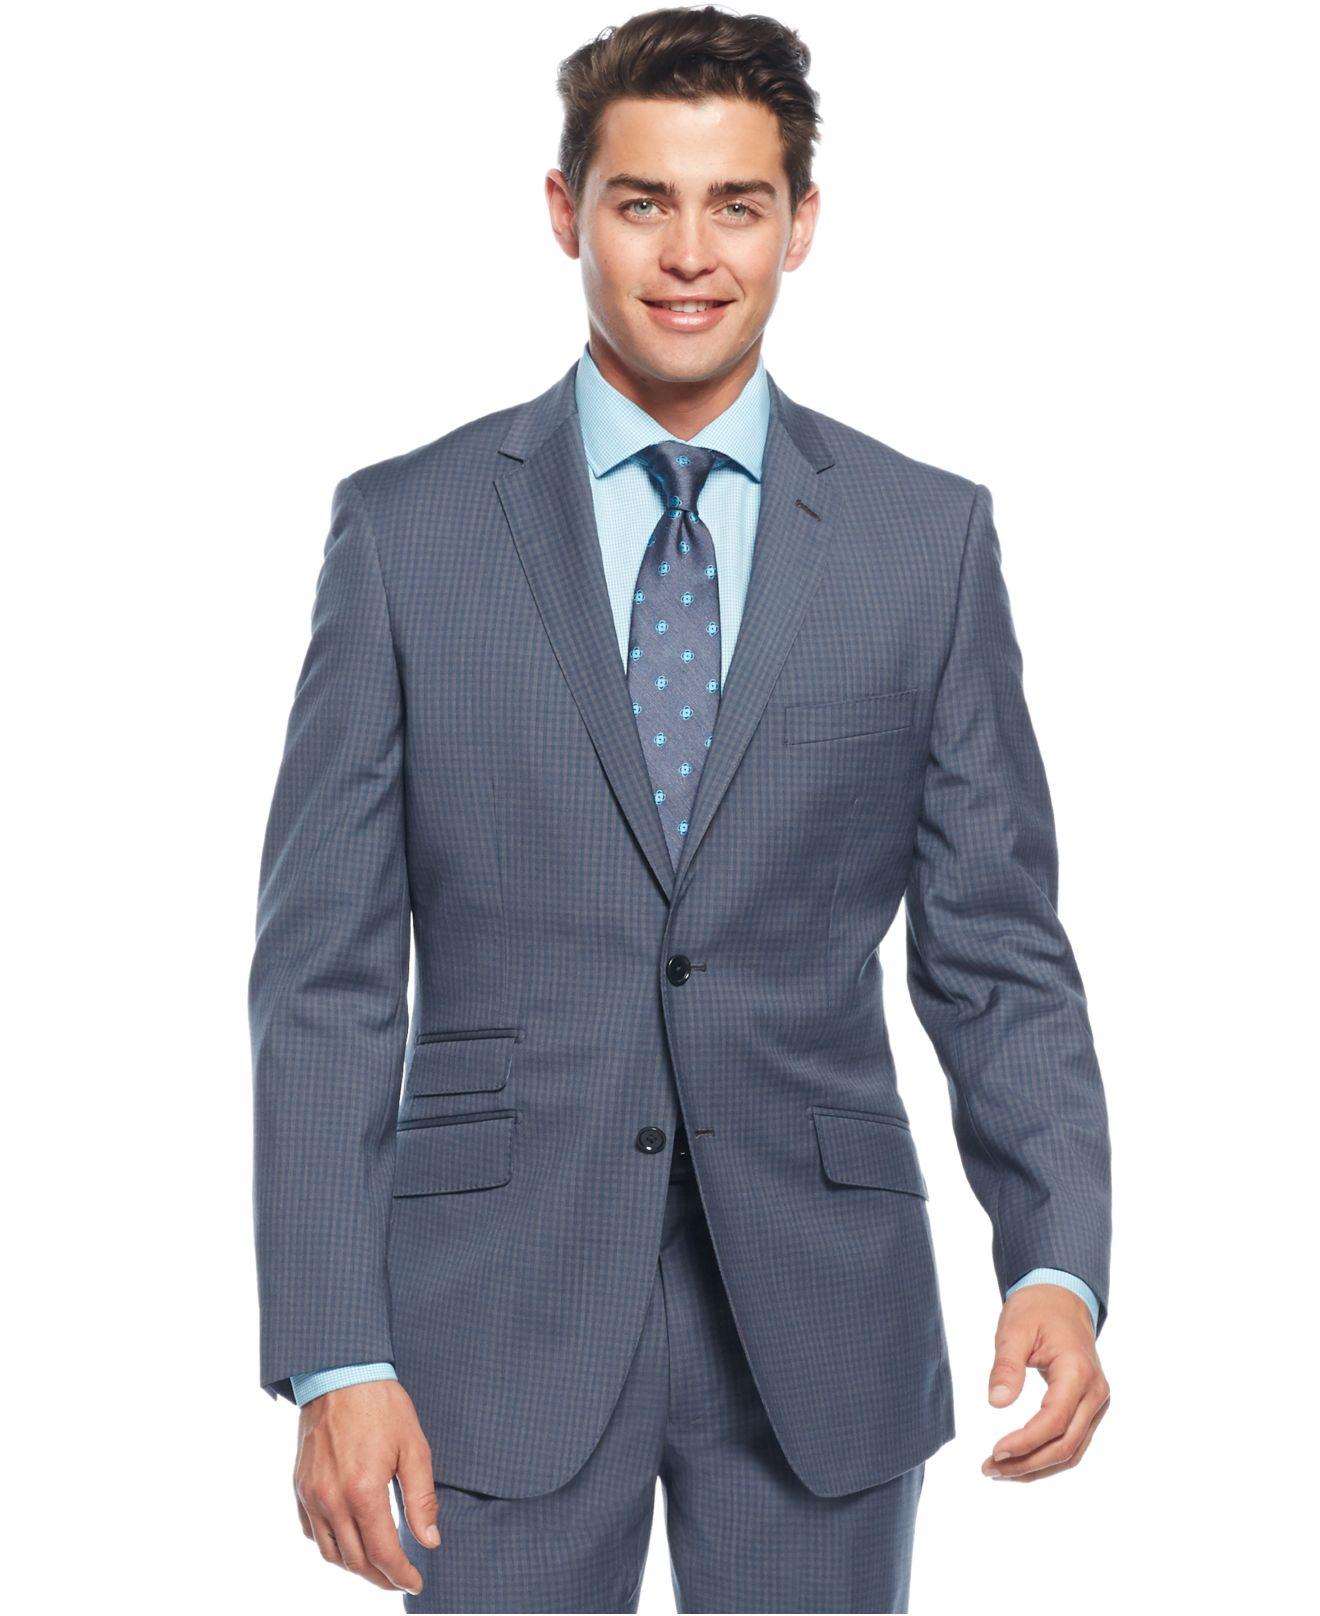 lyst english laundry light blue plaid slimfit suit in